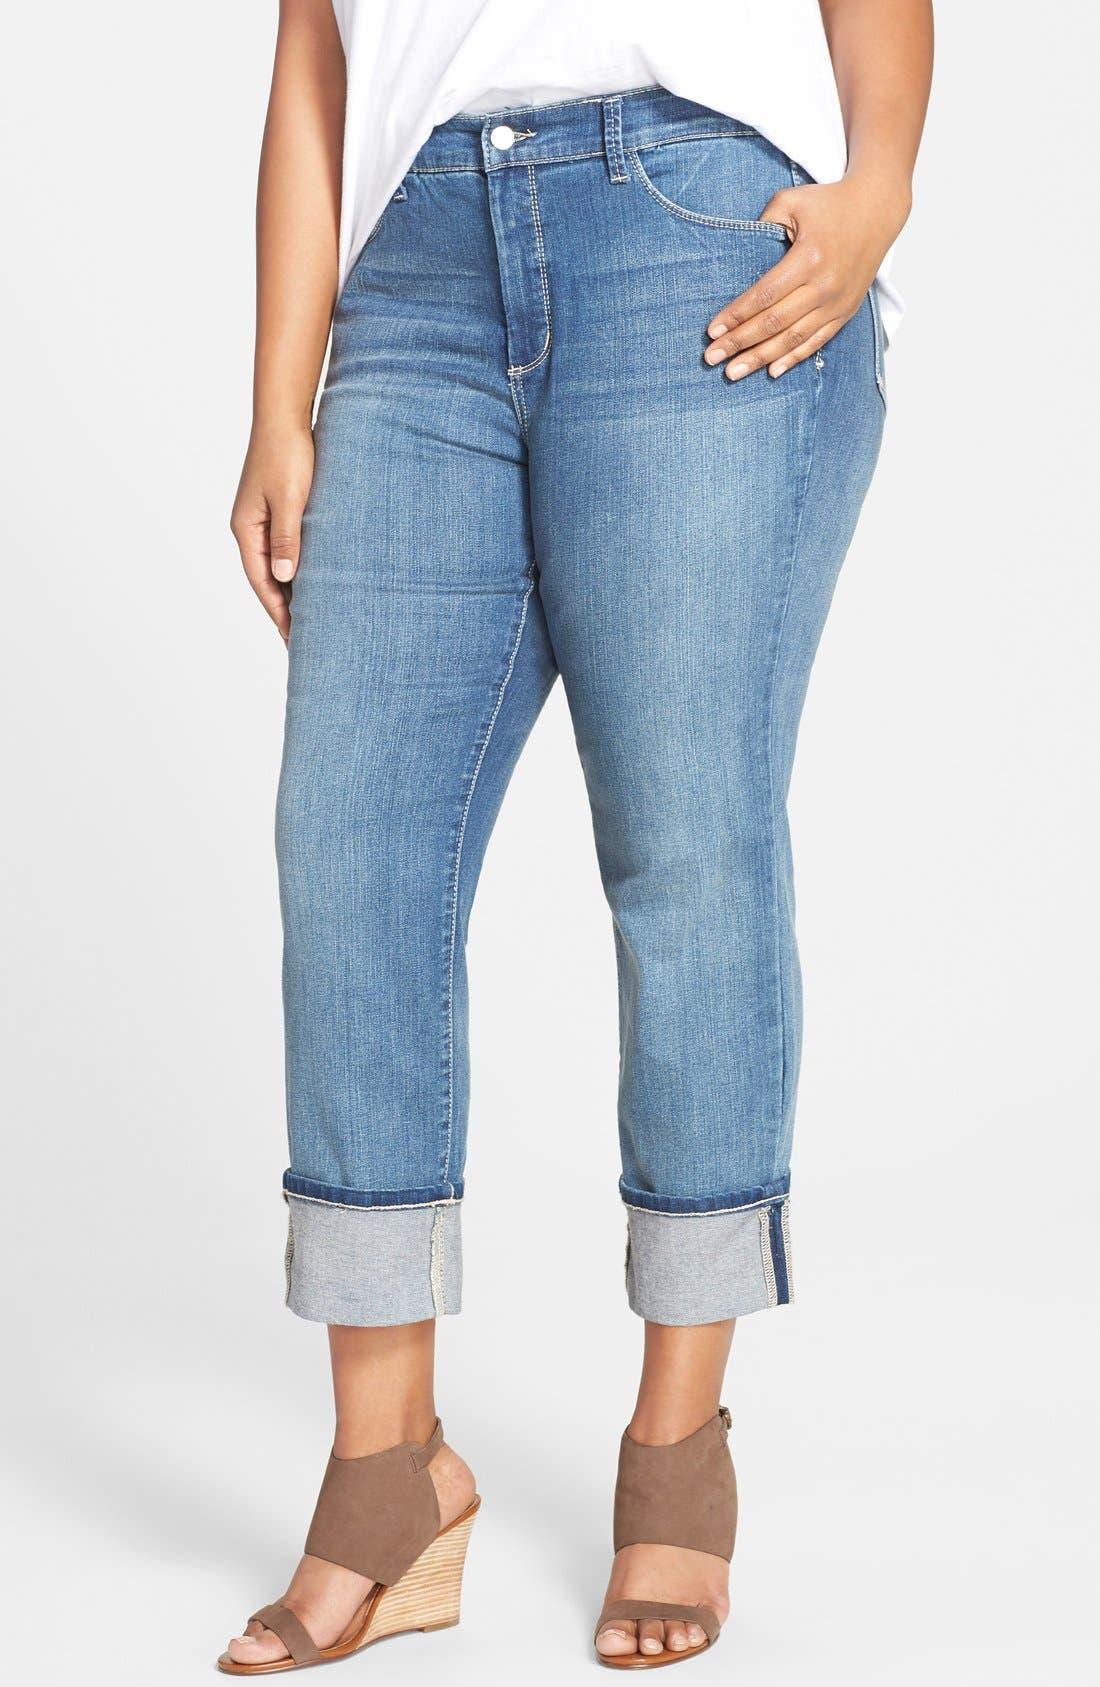 NYDJ Loreena Stretch Roll Cuff Crop Boyfriend Jeans (Heyburn) (Plus Size)